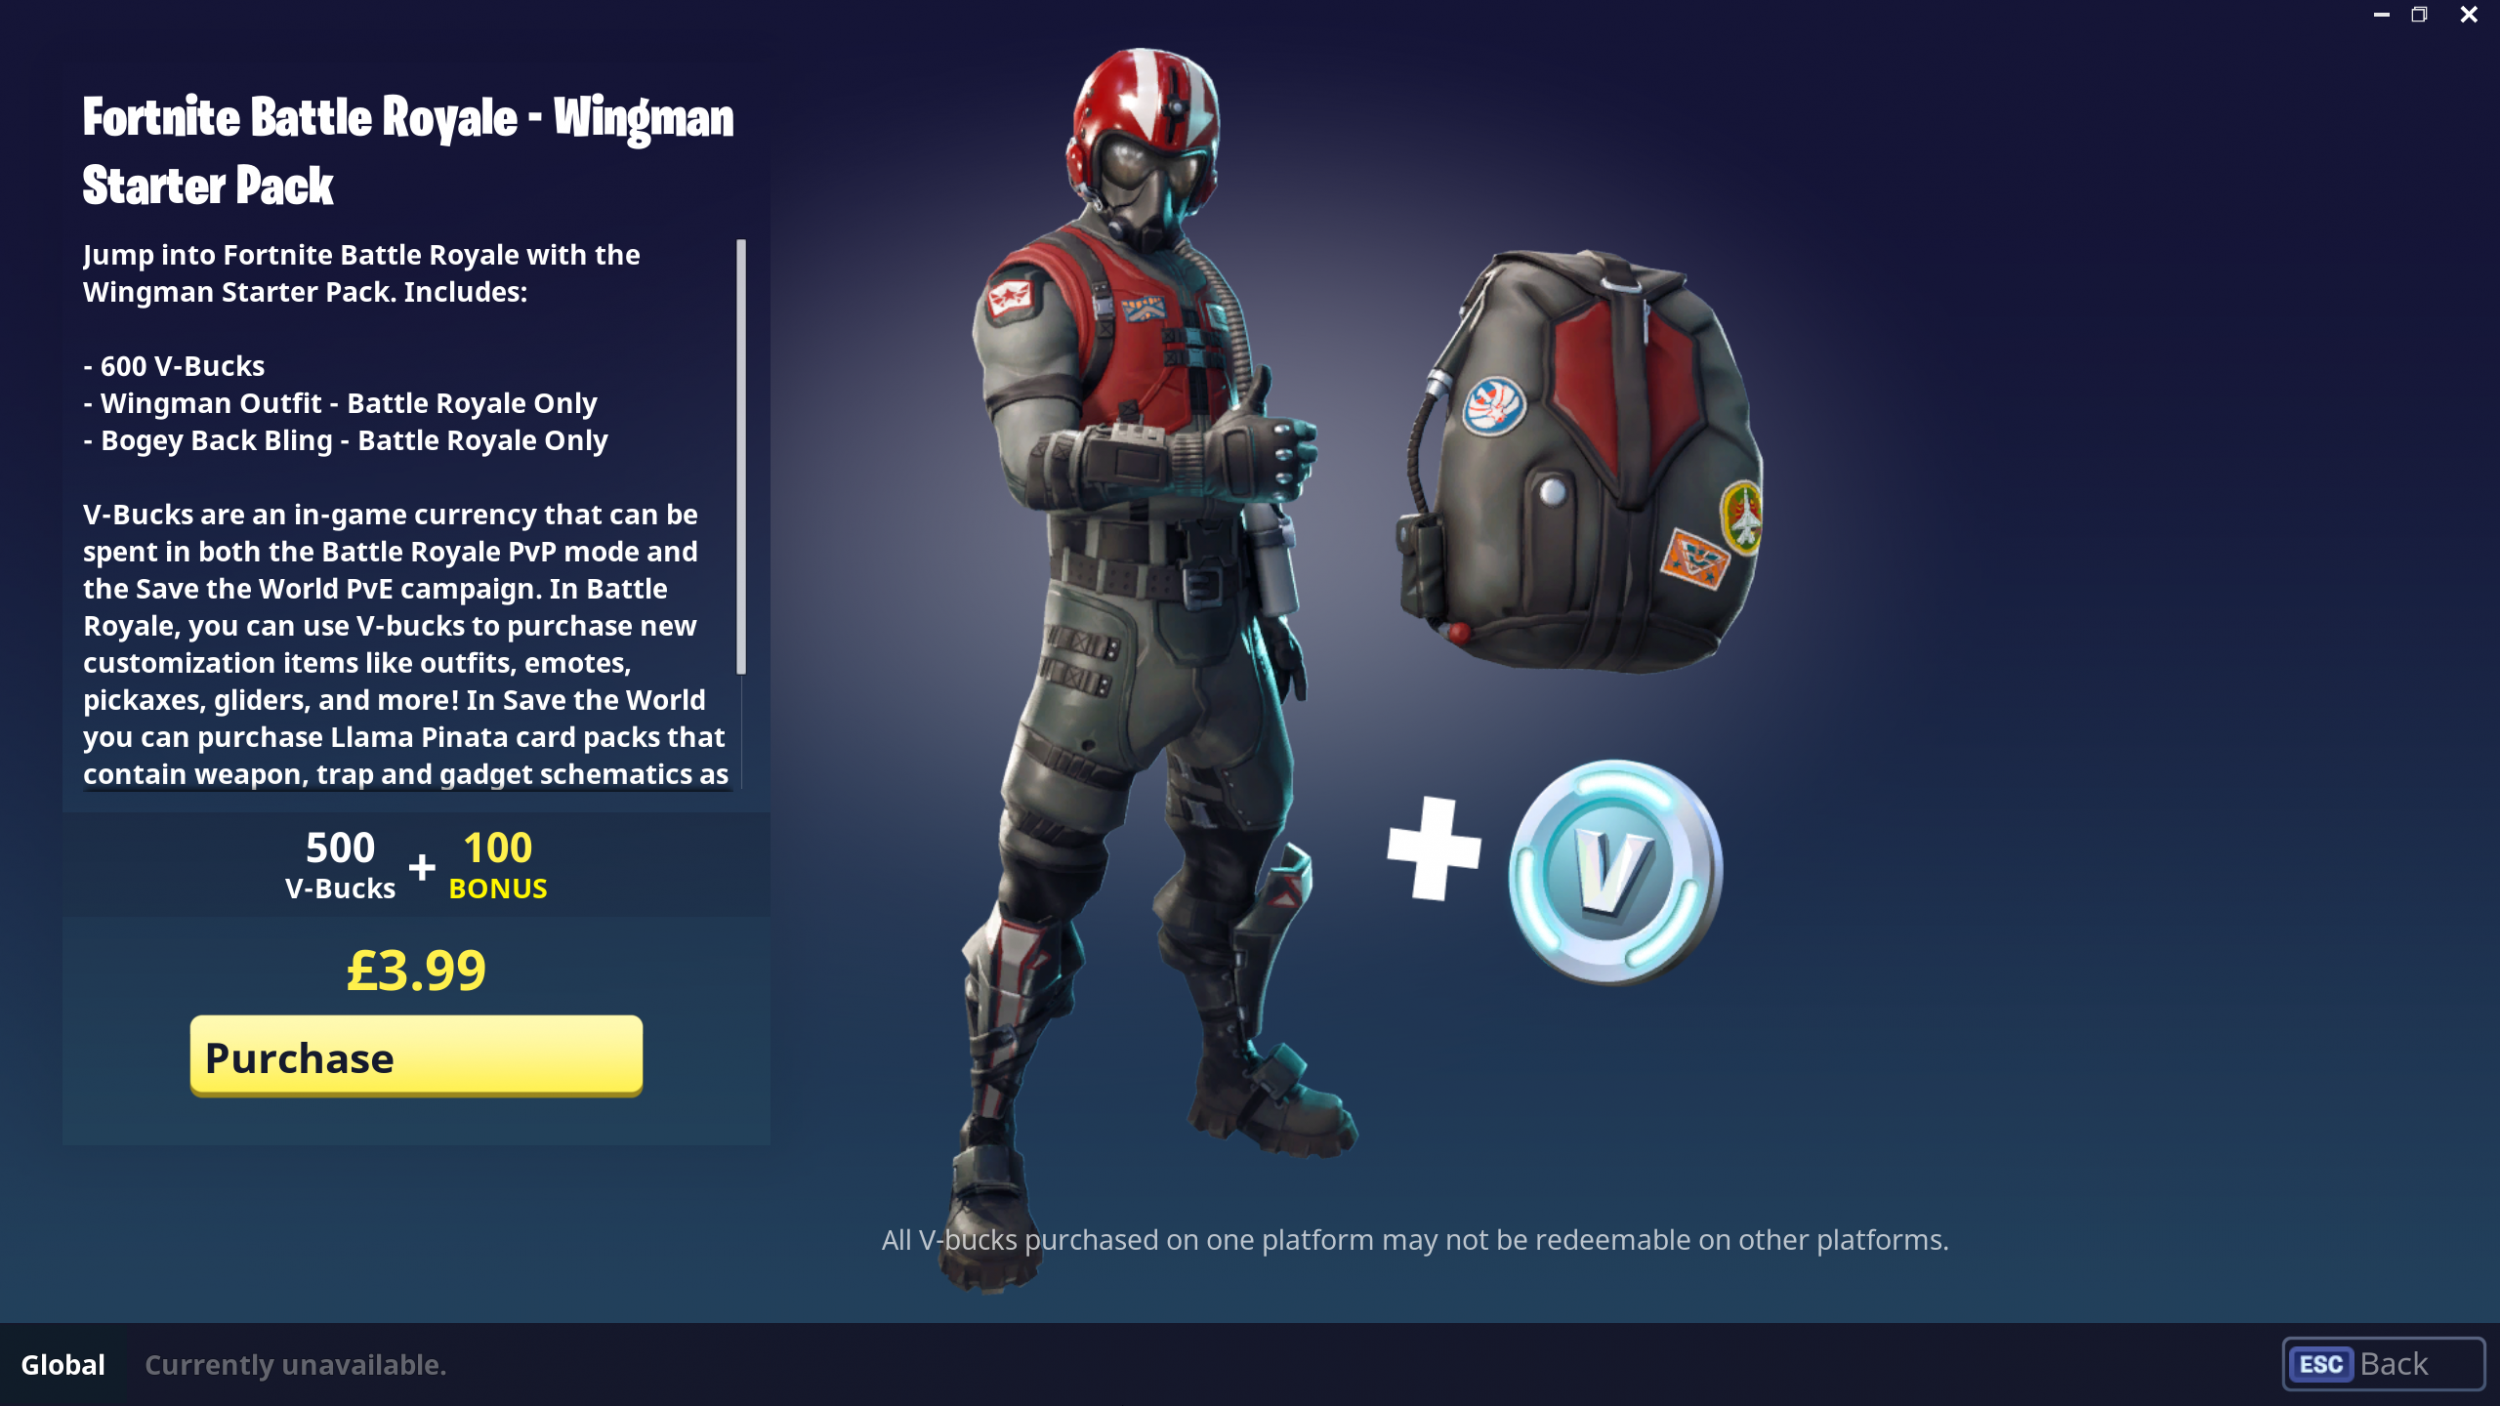 Fortnite Playstation All Free Skin Fortnite Wingman Starter Pack And Playstation Plus Celebration Bundle How To Unlock